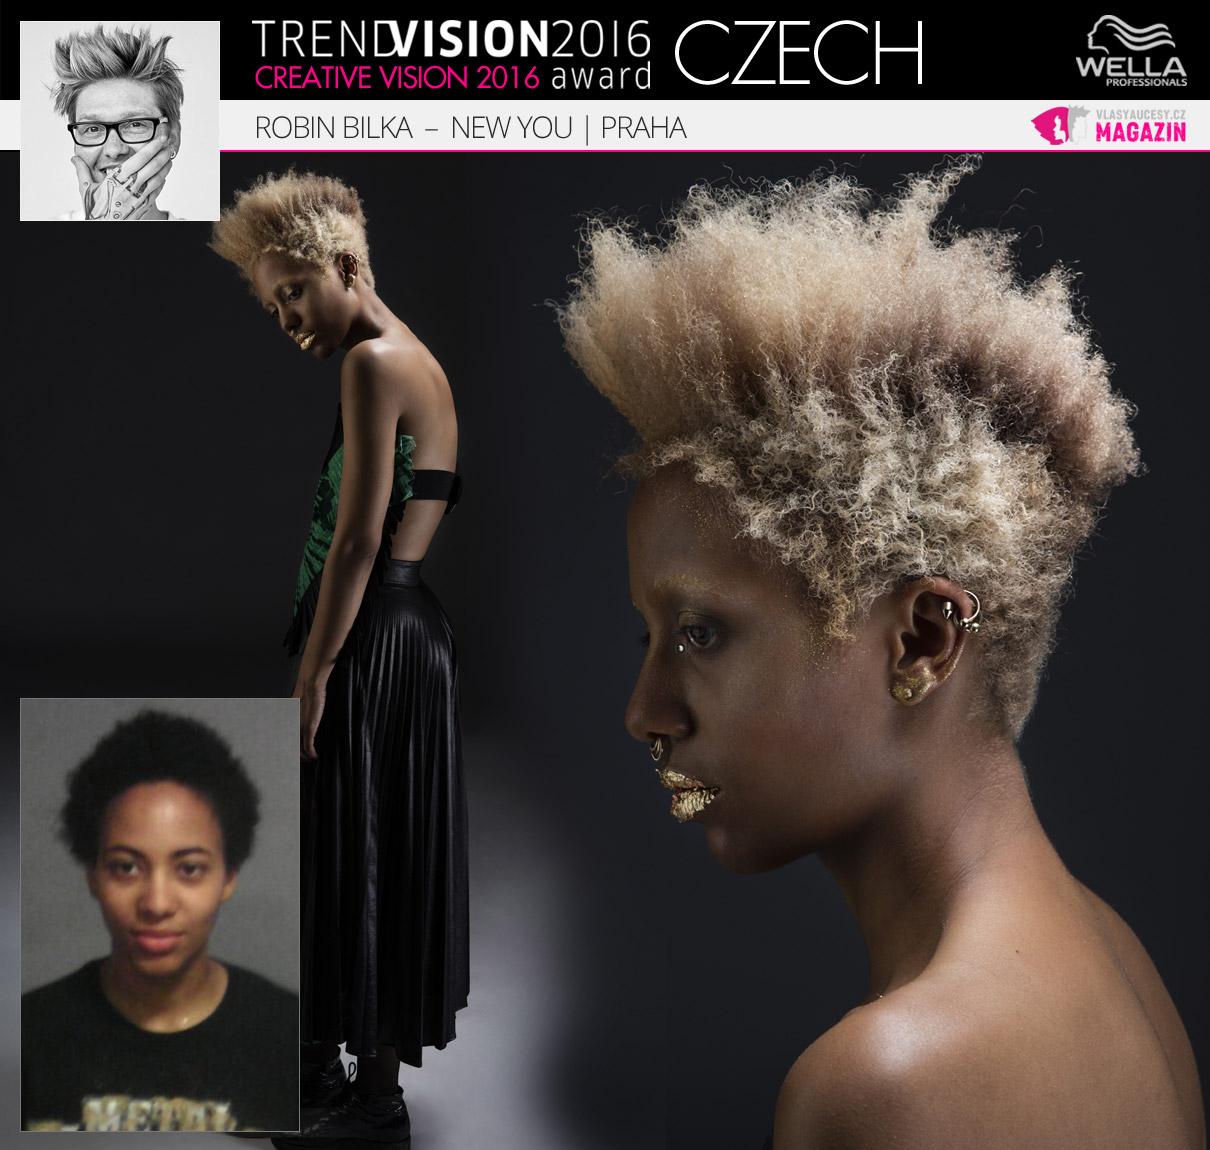 Robin Bilka, New You, Praha –Wella Professionals Trend Vision Award Česká republika, kategorie Creative Vision 2016.